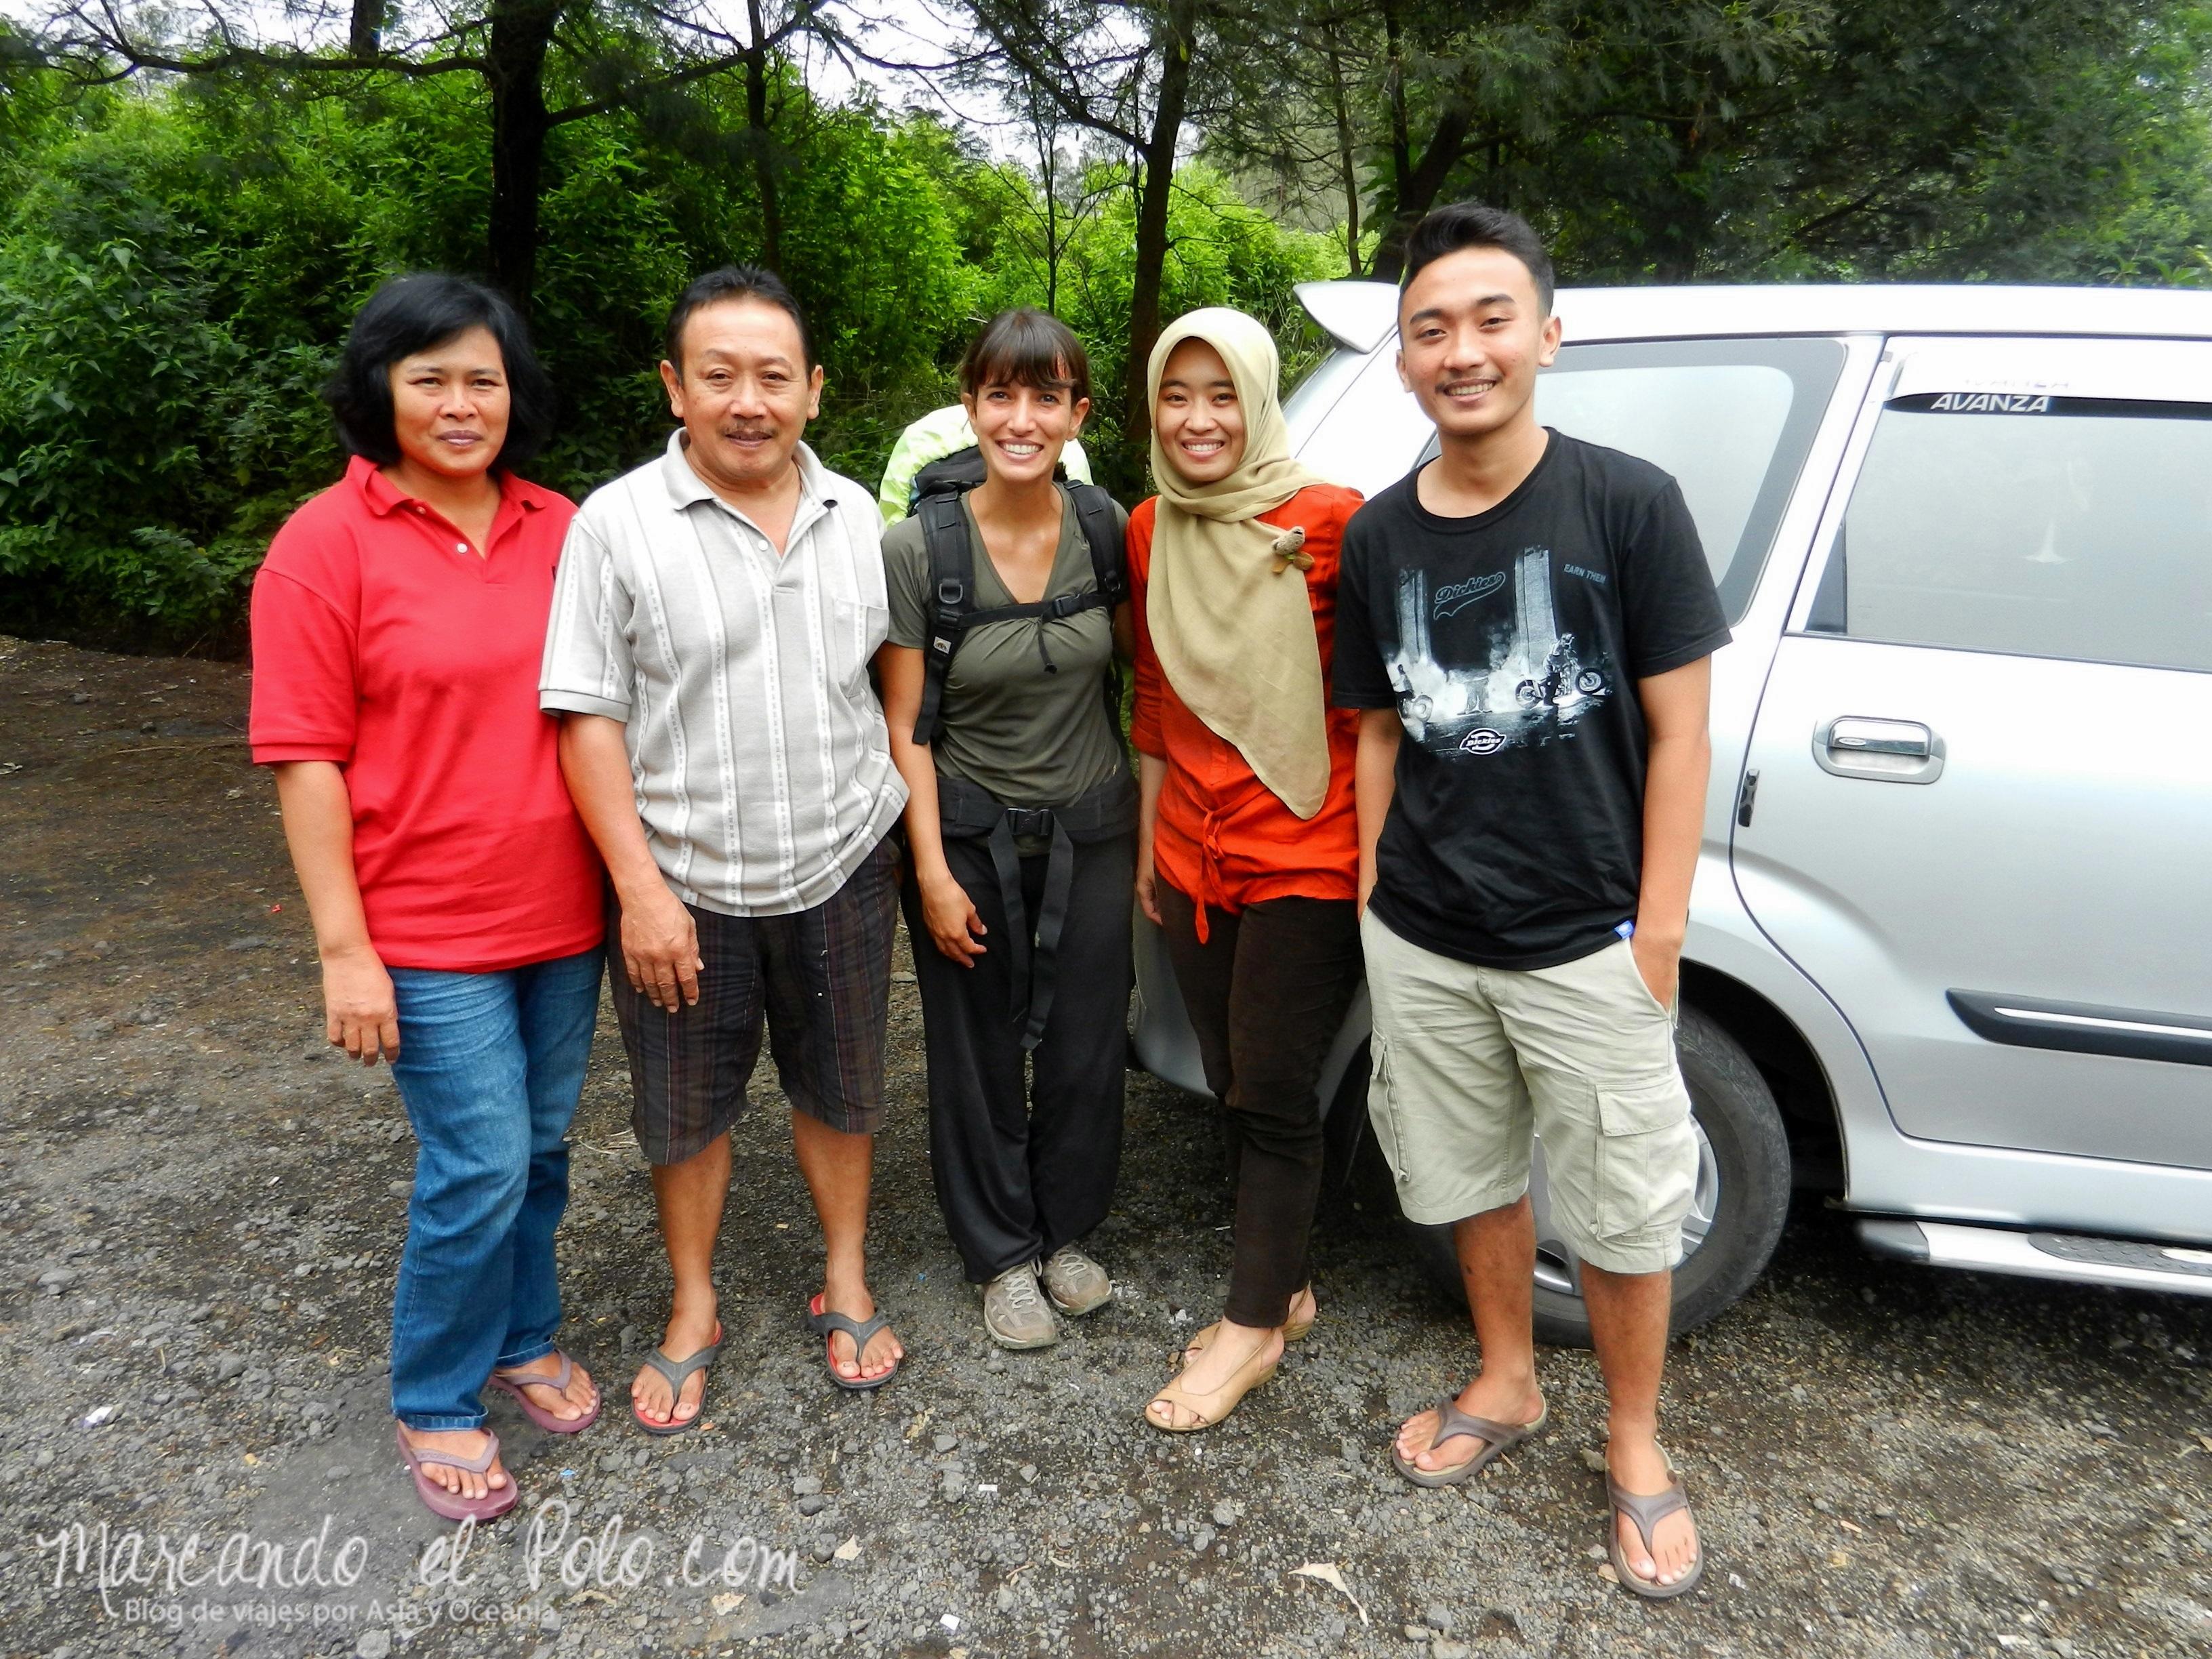 Familia que nos acercó hasta la base del volcán Ijen.